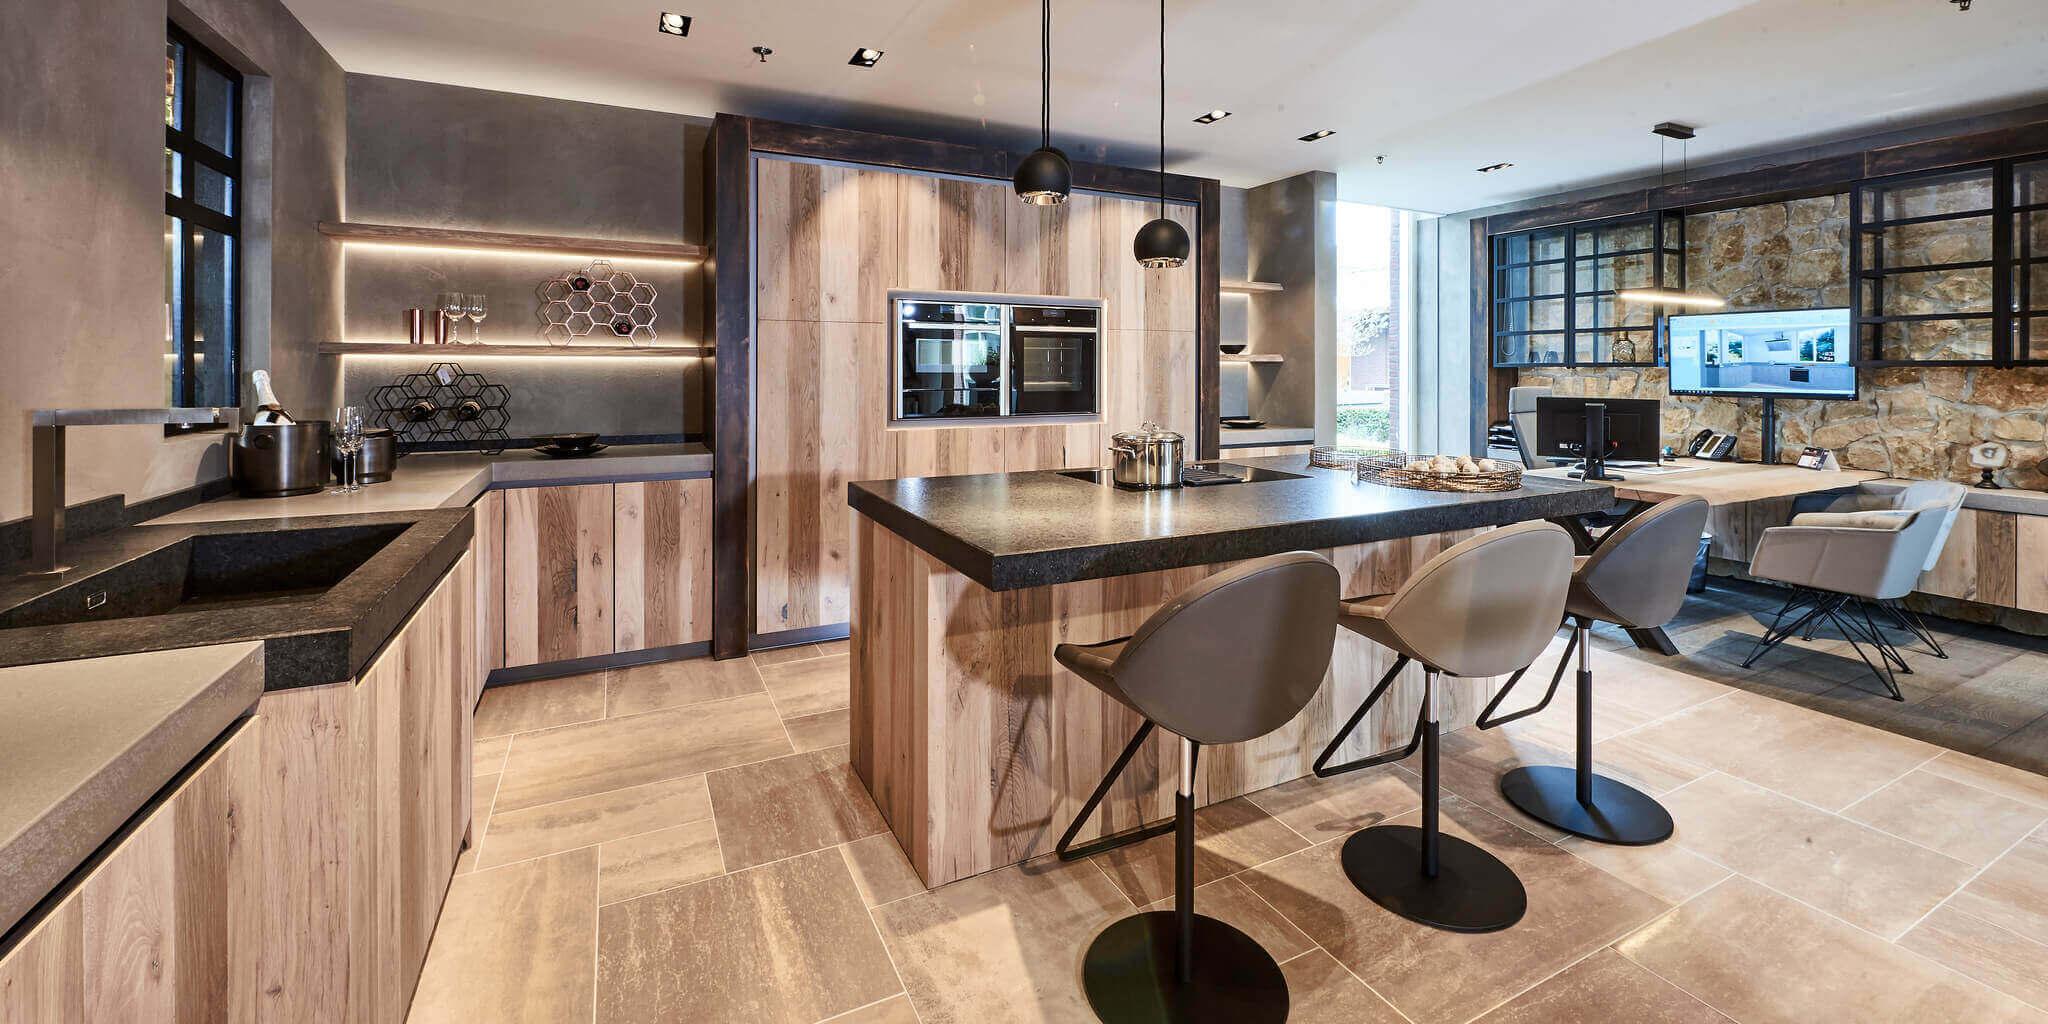 Tielemans exclusief eiken houten keuken kookeiland